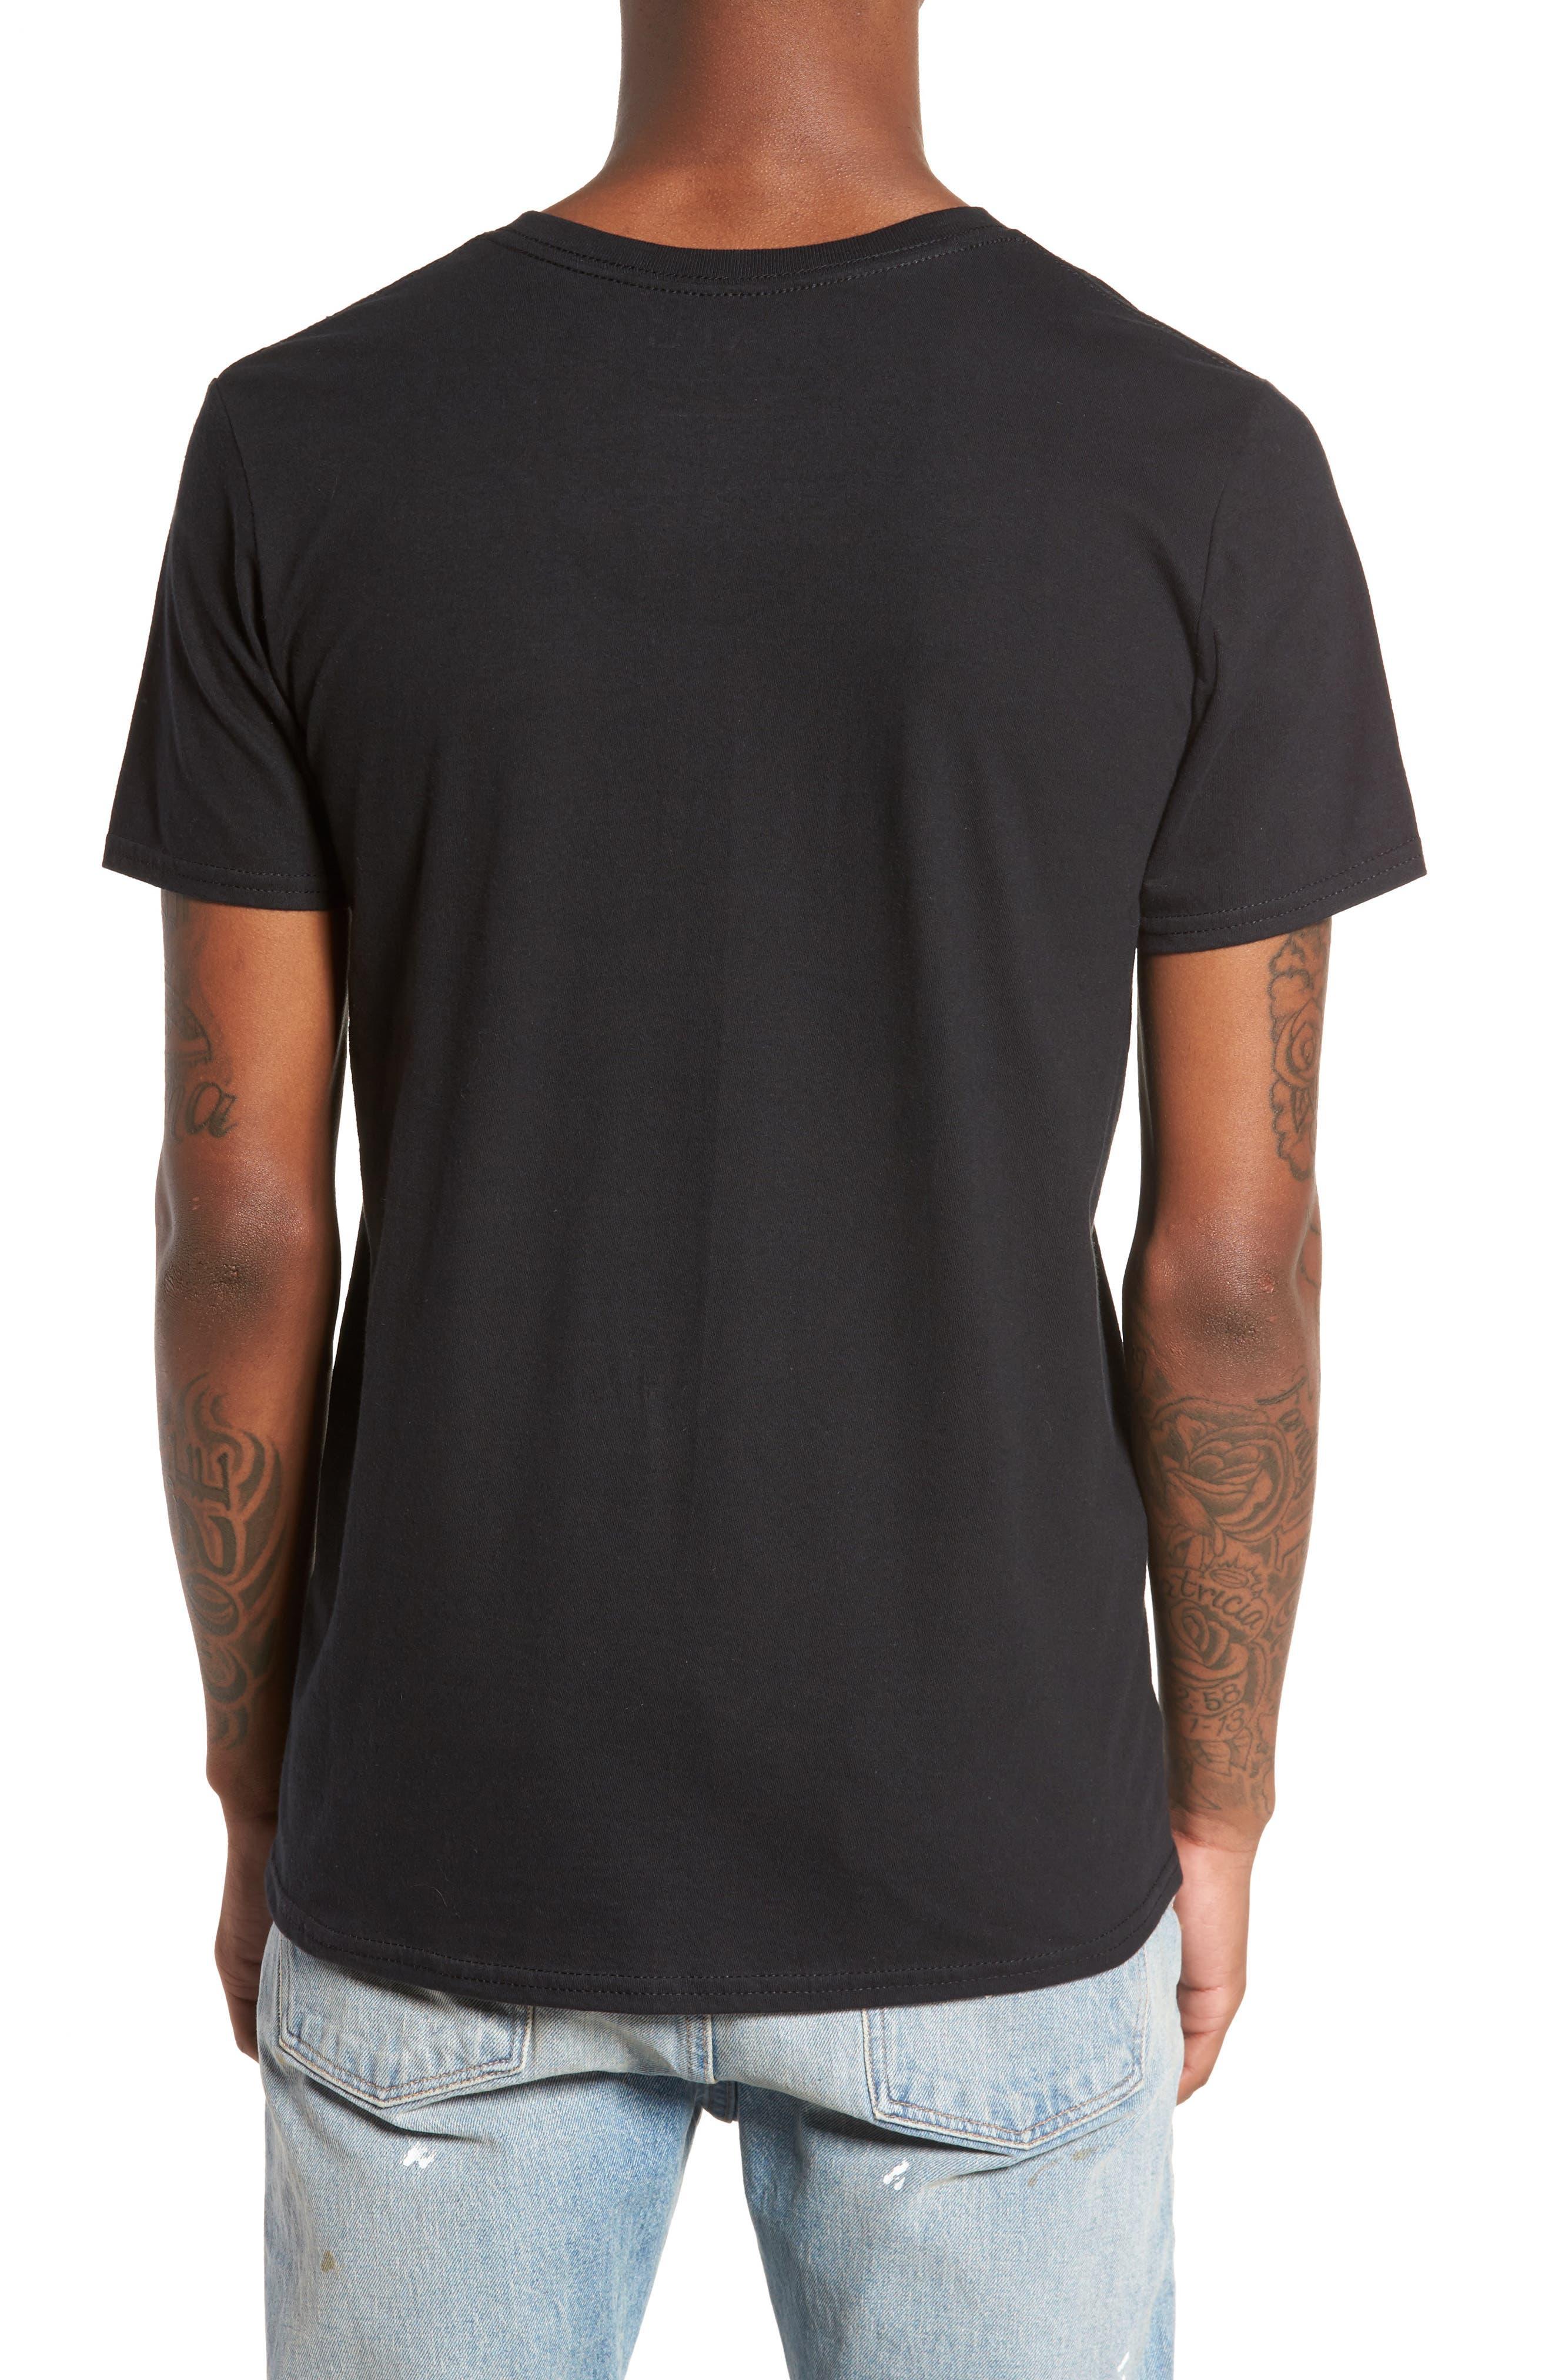 Tis The Season Embroidered T-Shirt,                             Alternate thumbnail 2, color,                             Black Tis The Season